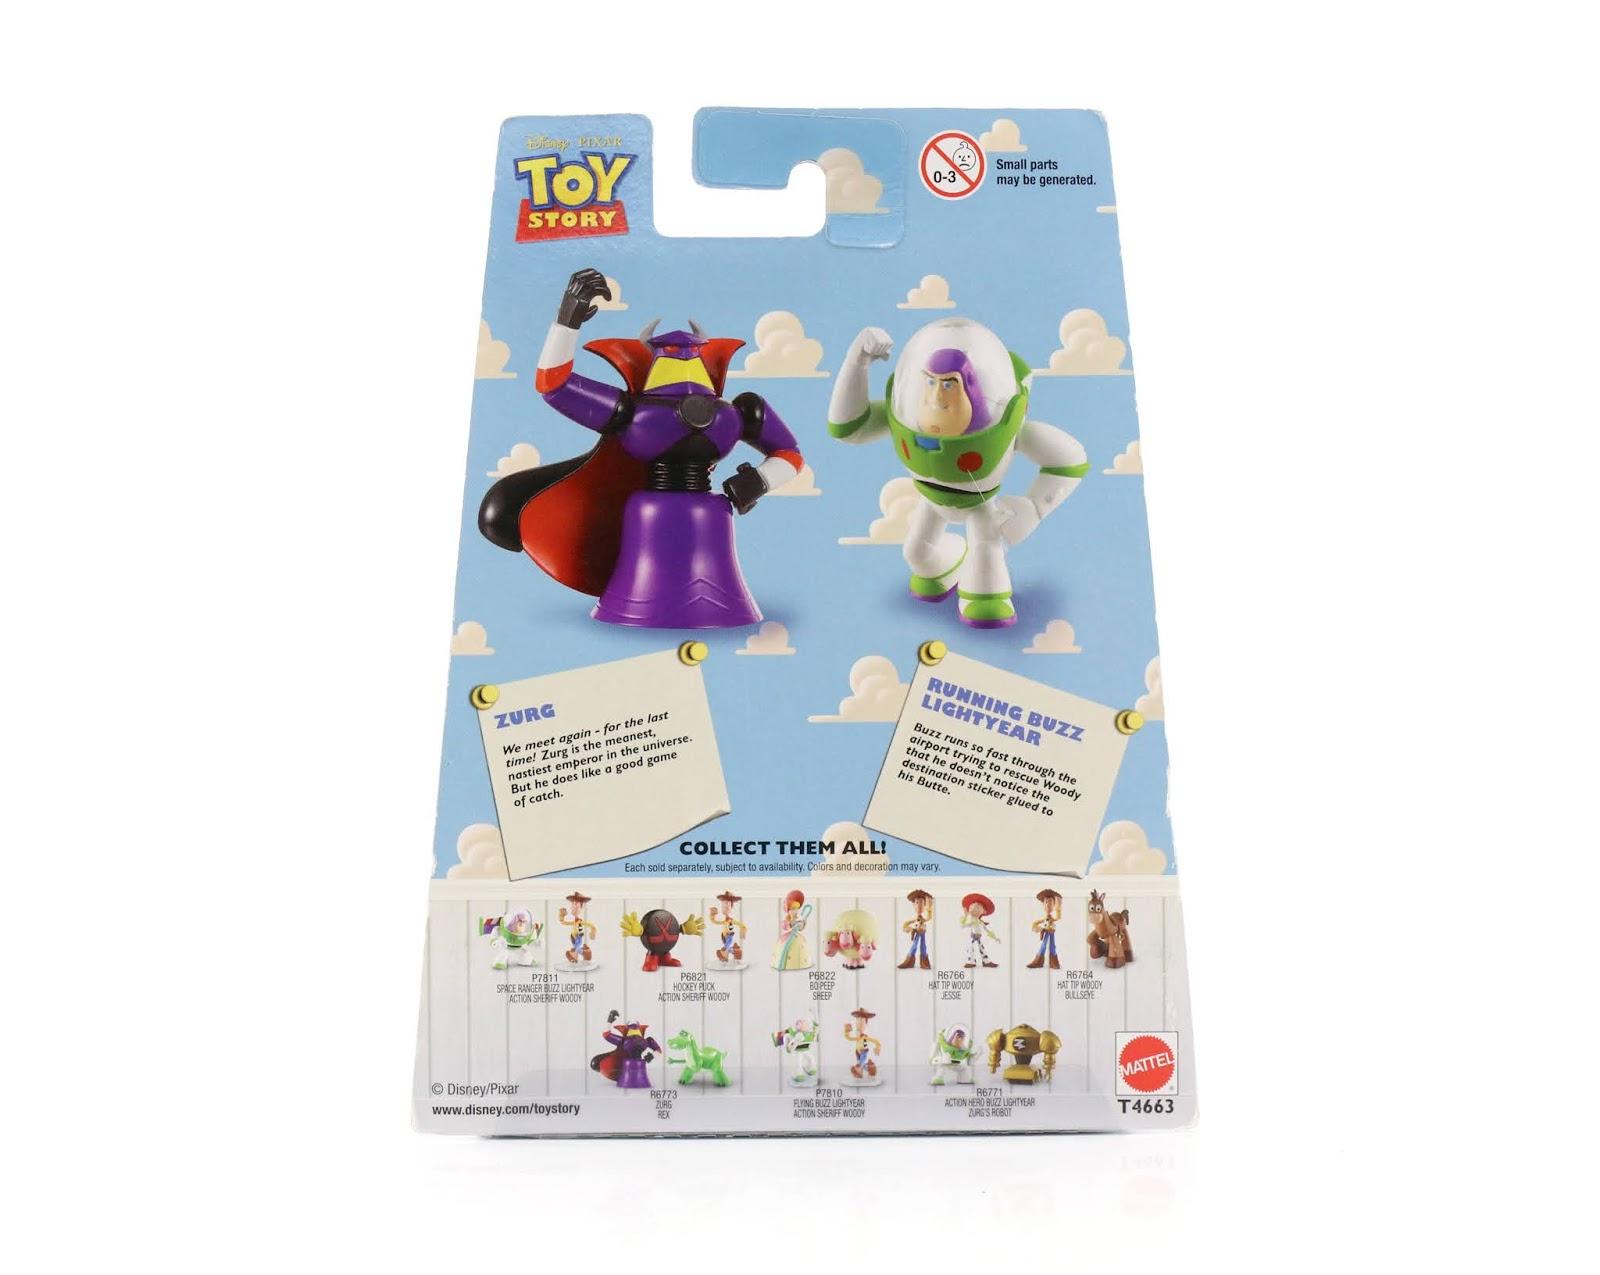 toy story buddy pack running buzz lightyear